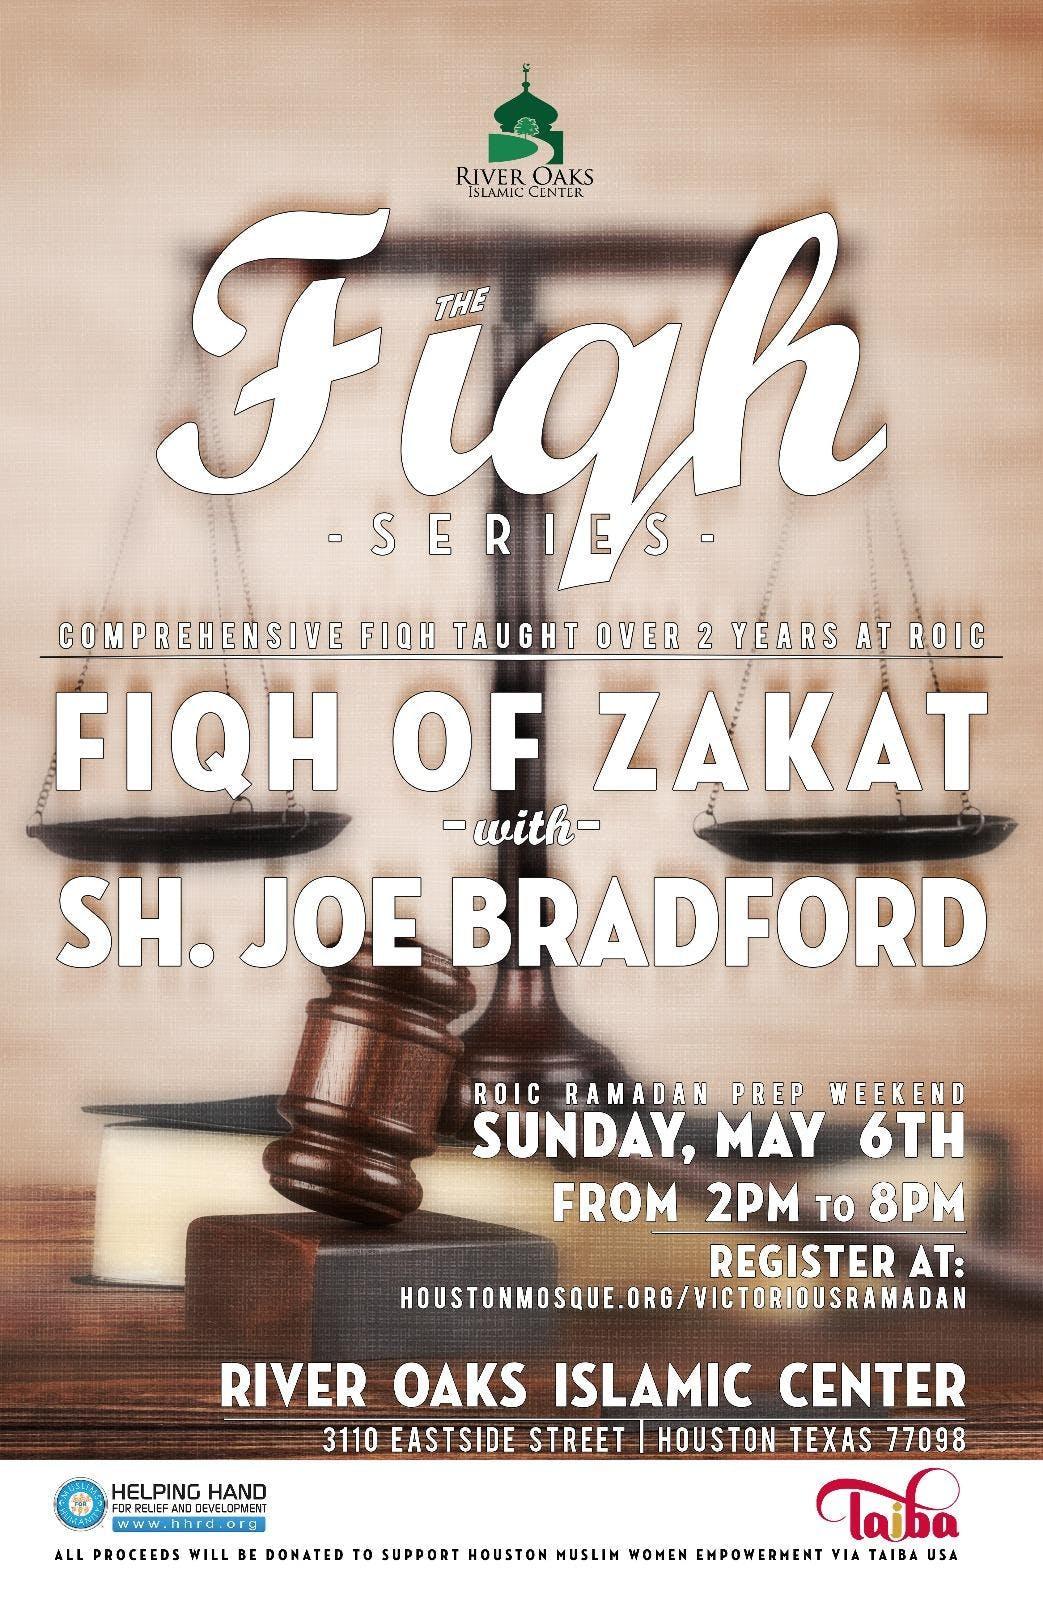 Fiqh of Zakah with Sheikh Joe Bradford